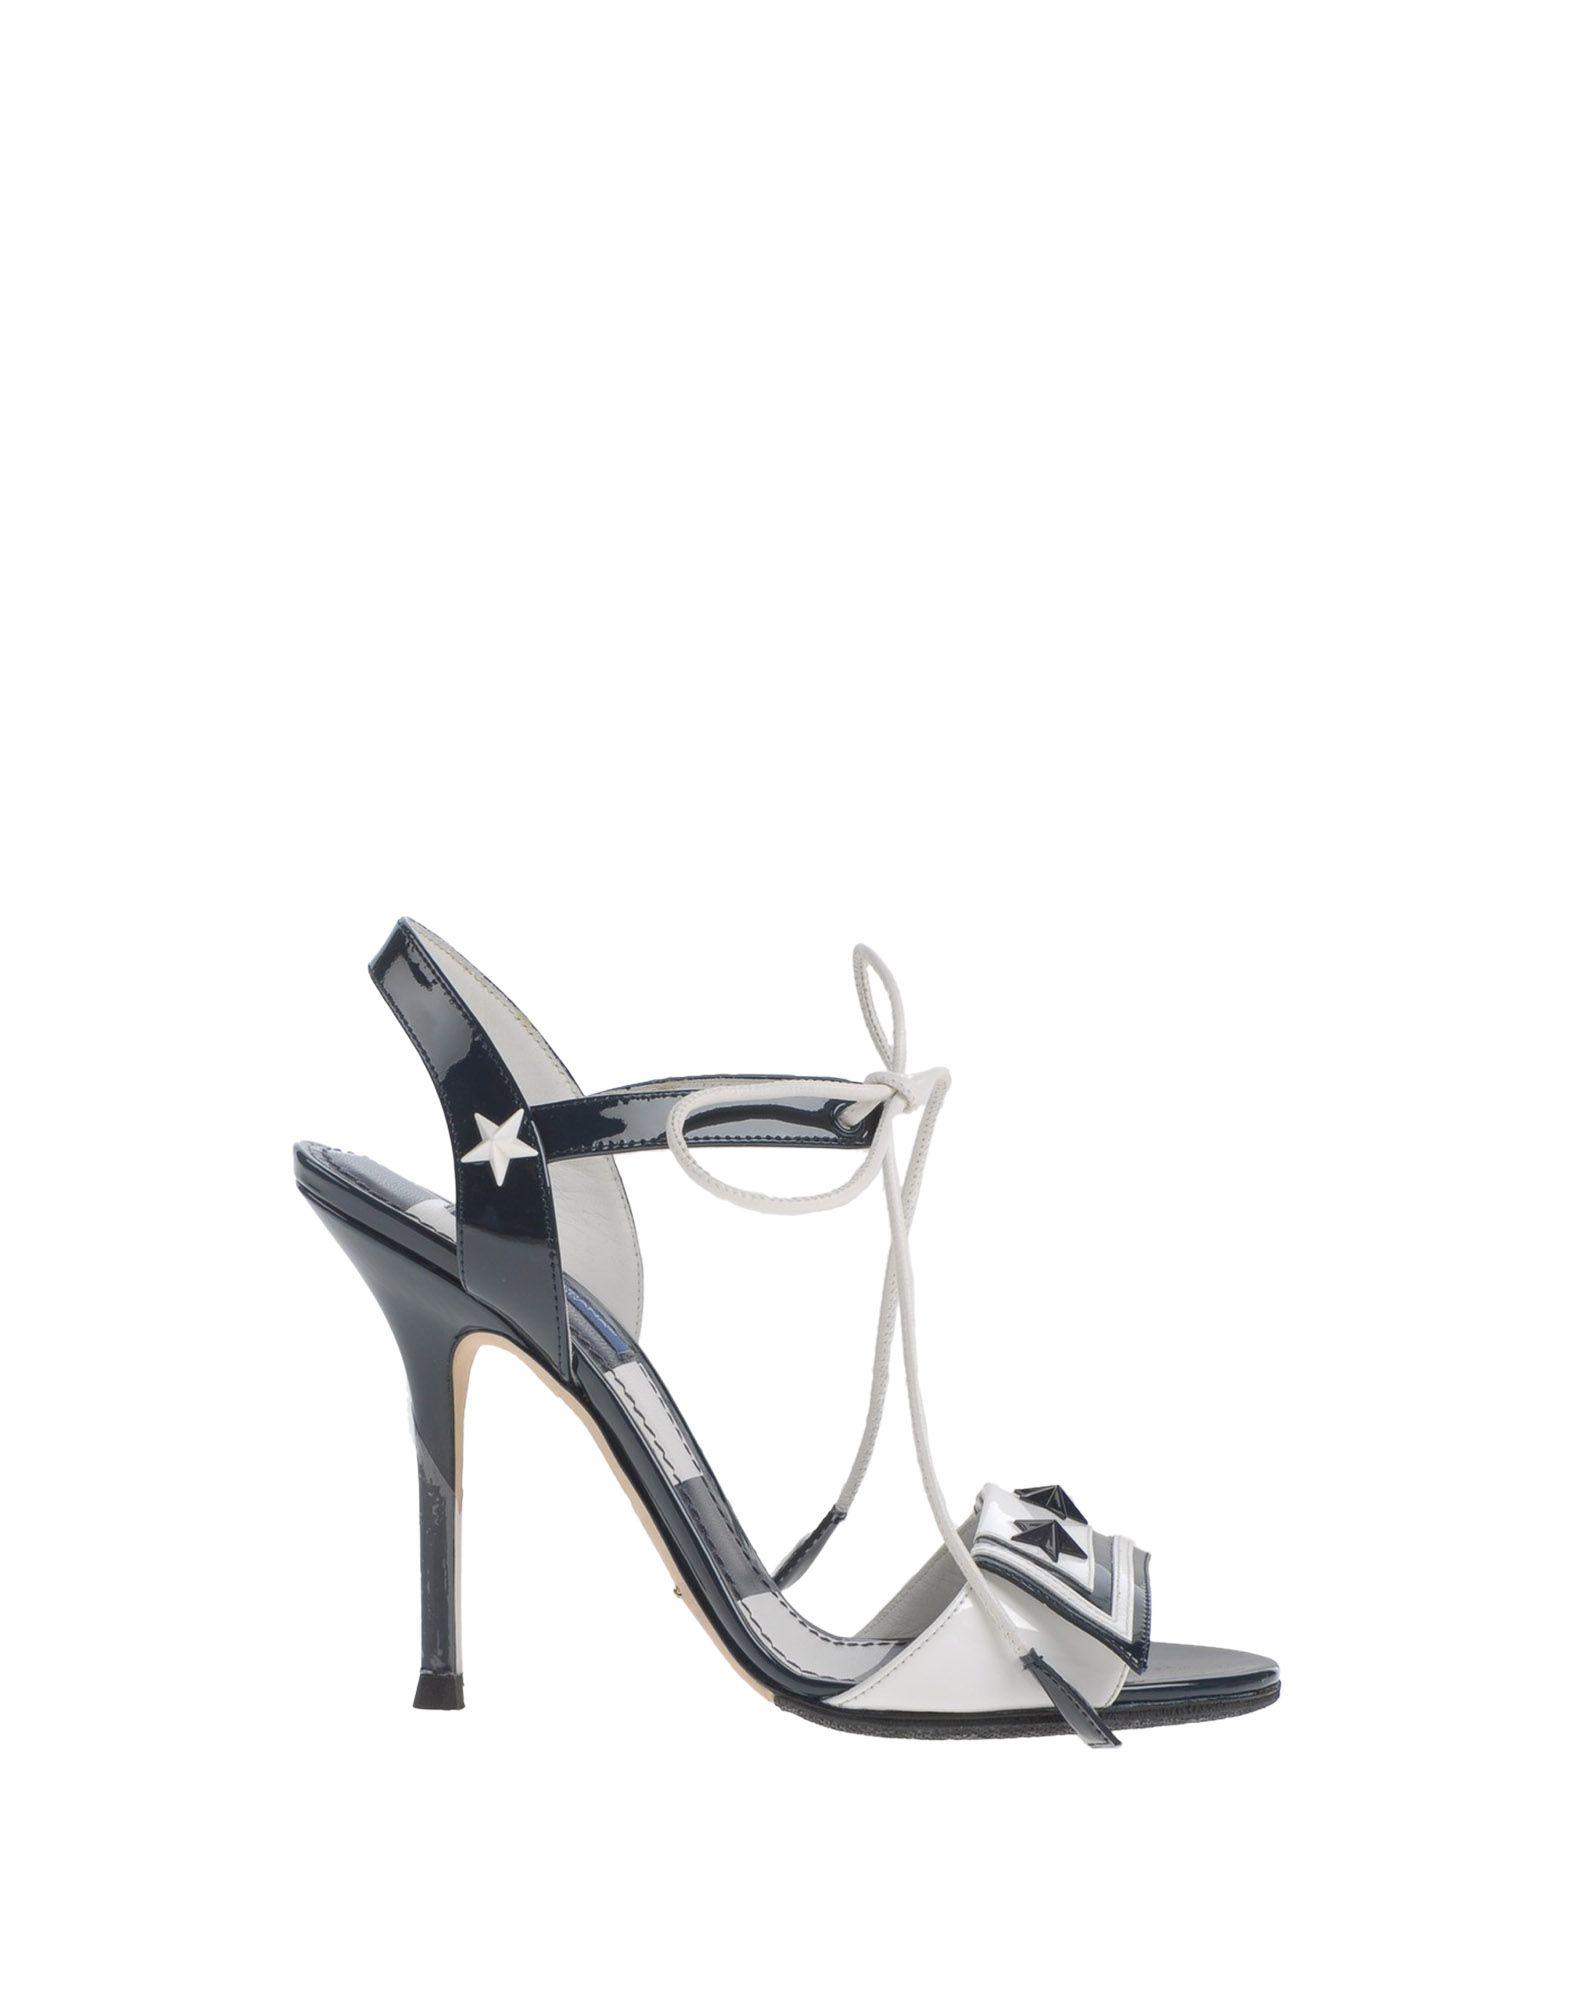 Dolce & Gabbana gut Sandalen Damen  11362703DAGünstige gut Gabbana aussehende Schuhe 1048b6